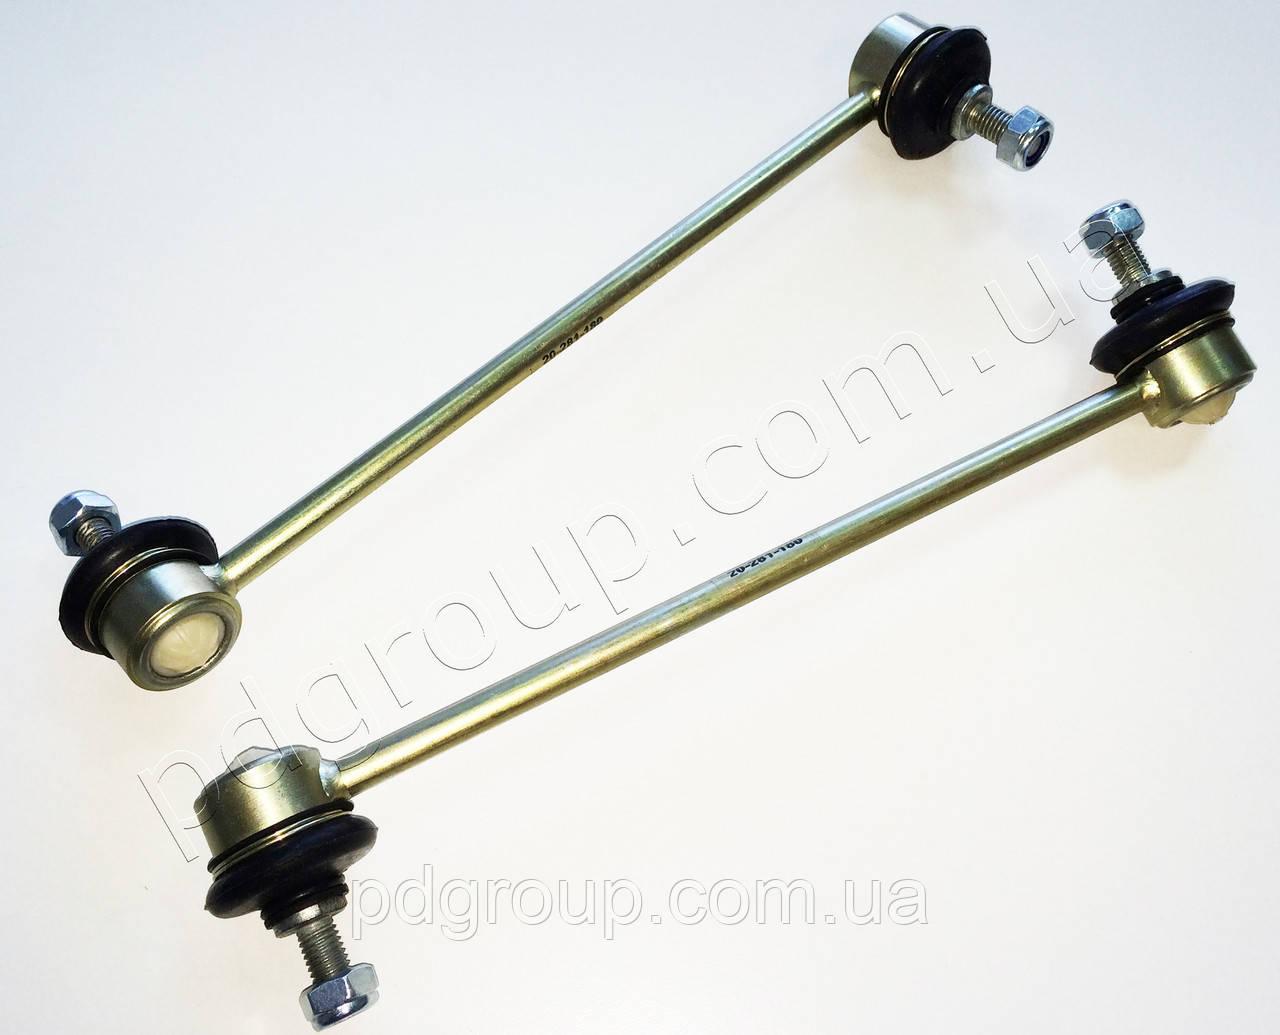 Стойка стабилизатора усиленная Opel Vivaro (2001-) Передняя 4408904 / JTS432 / 2551302 Опель Виваро